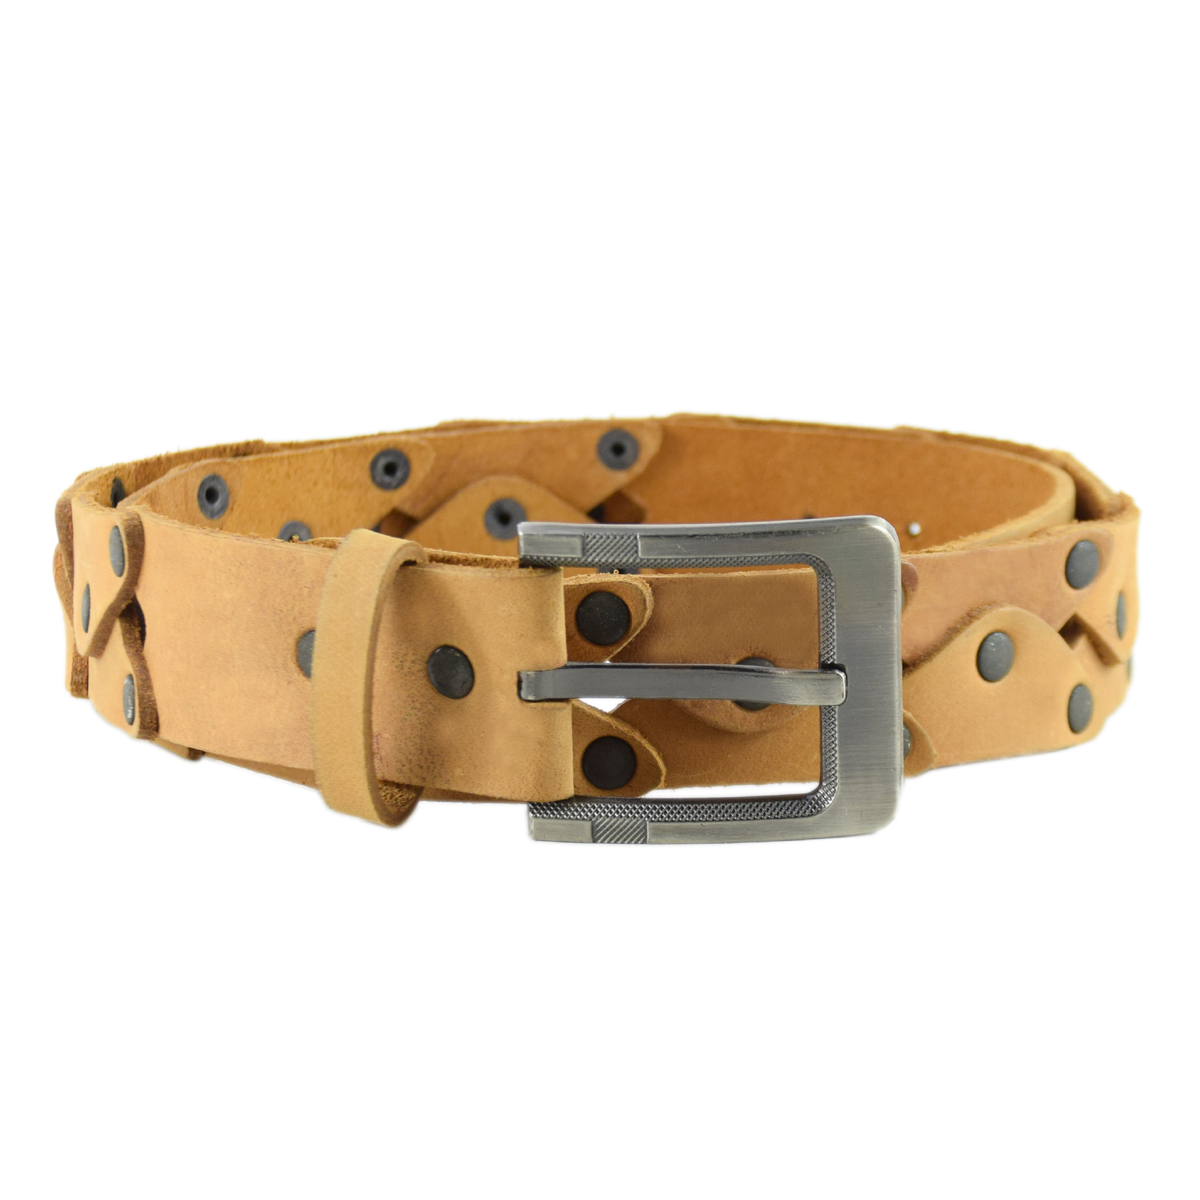 "Metal Buckle Unique Handmade Leather Belt 1.5"""